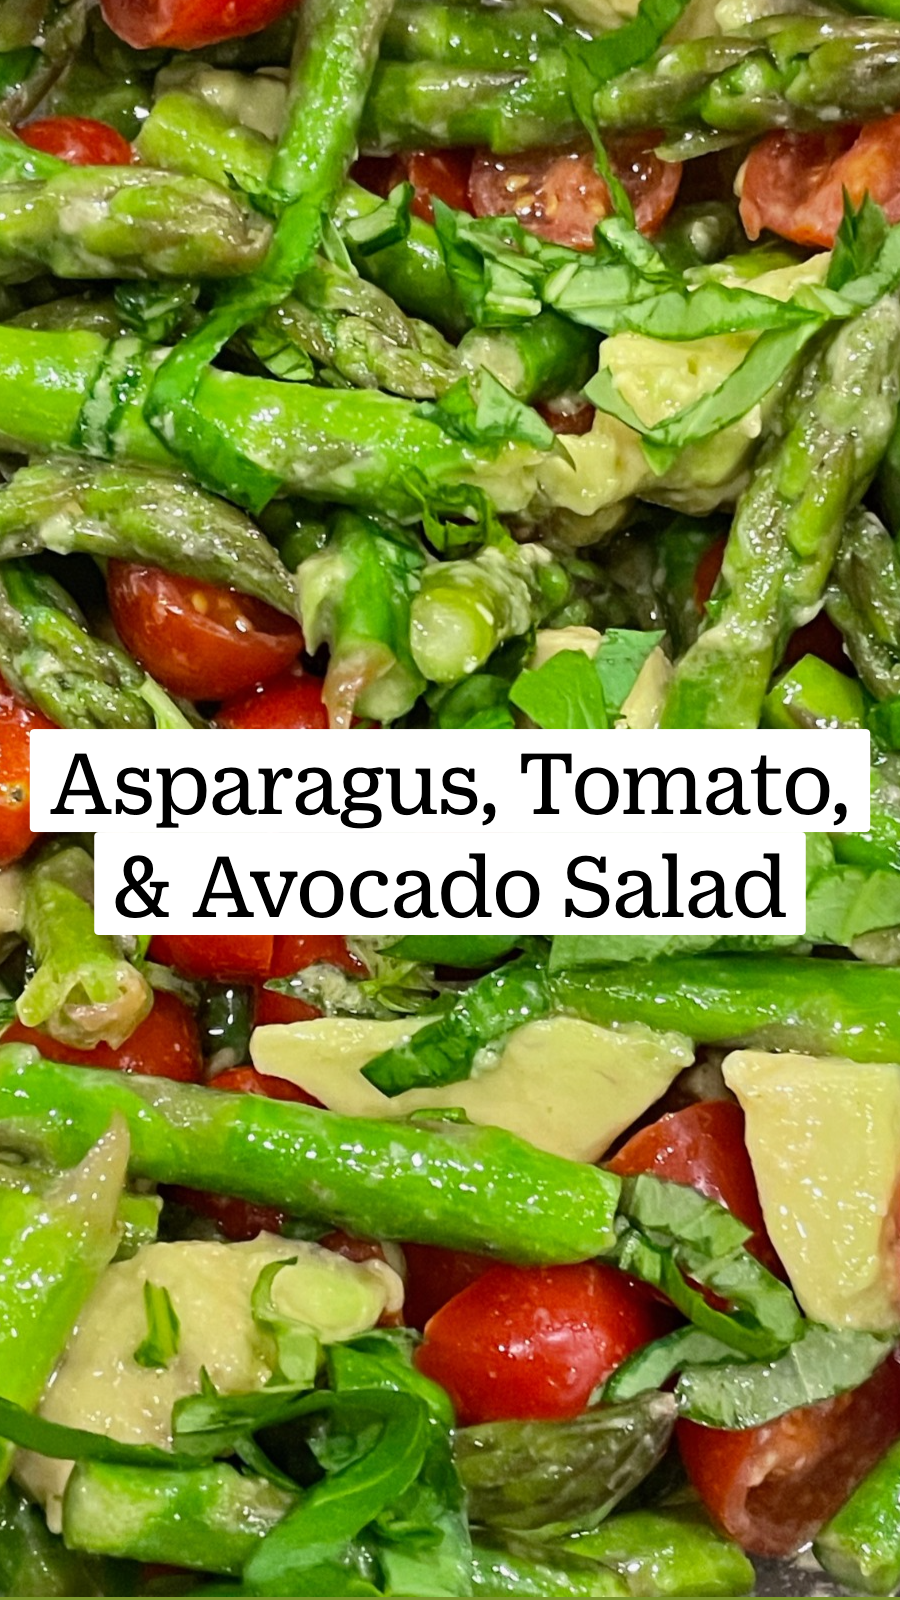 Asparagus, Tomato,& Avocado Salad Healthy Vegetarian, Gluten-Free Recipe